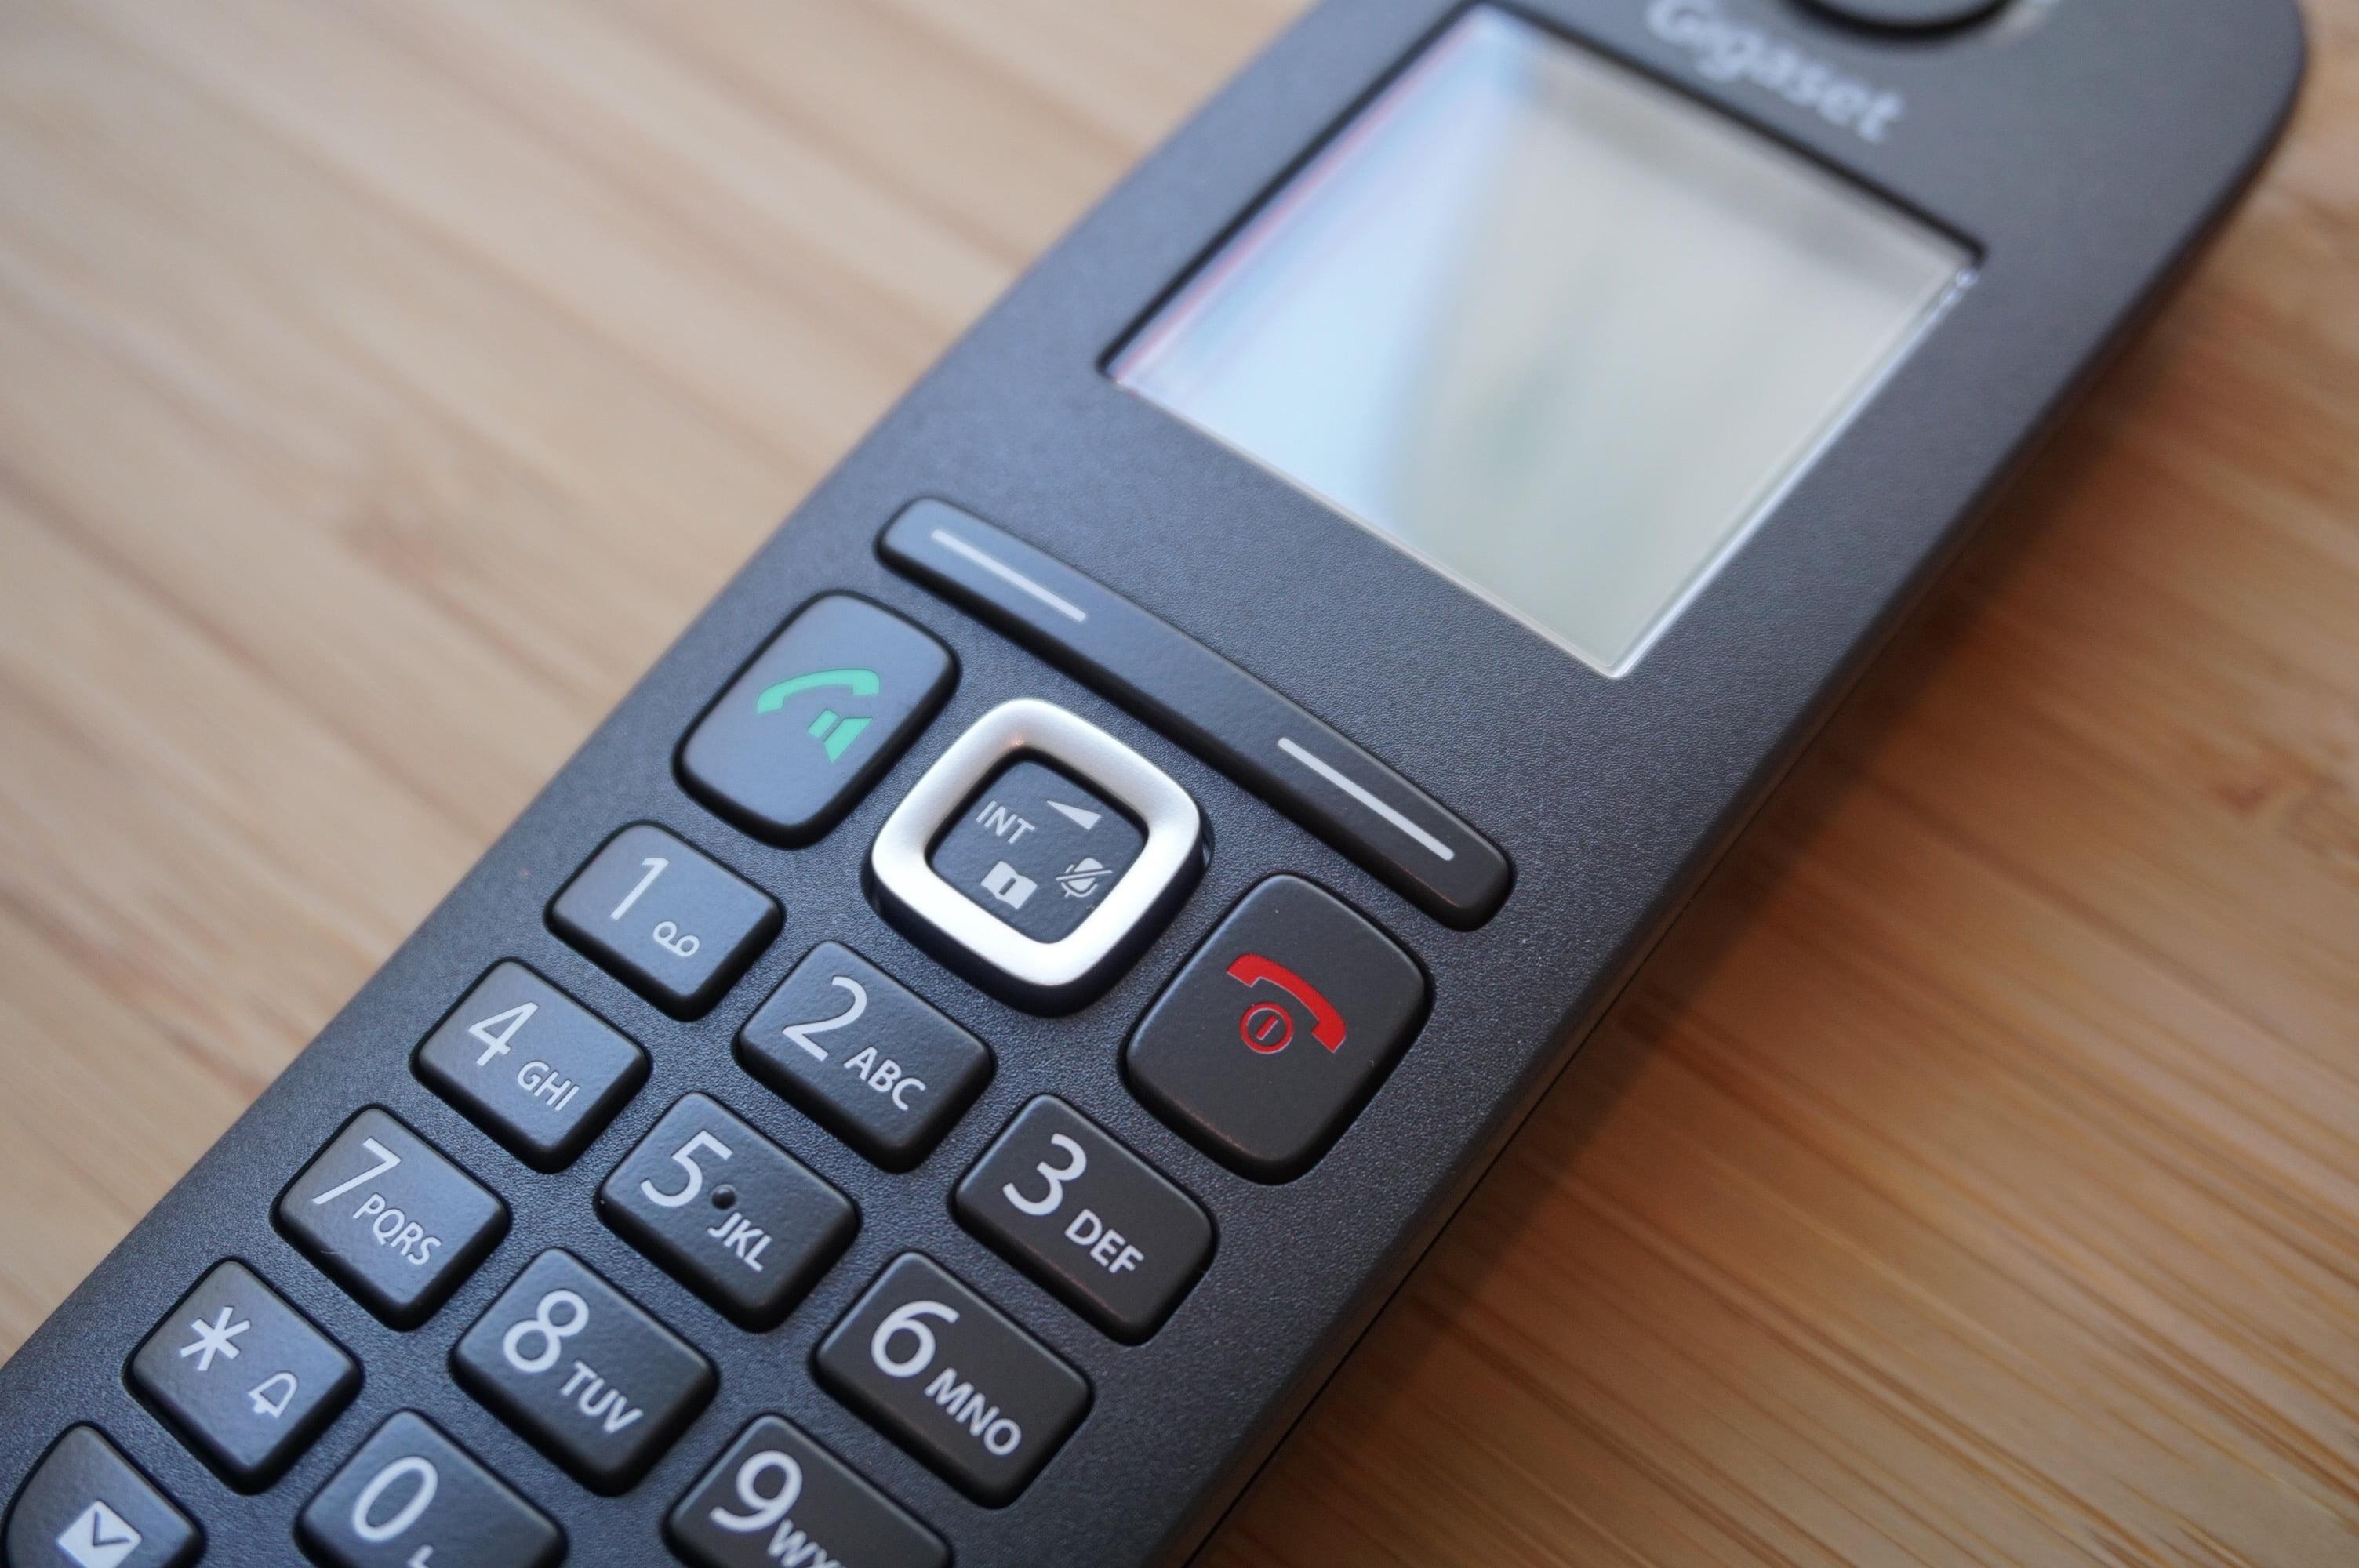 Review: Gigaset A540 CAT Voip IP Telefon im Test